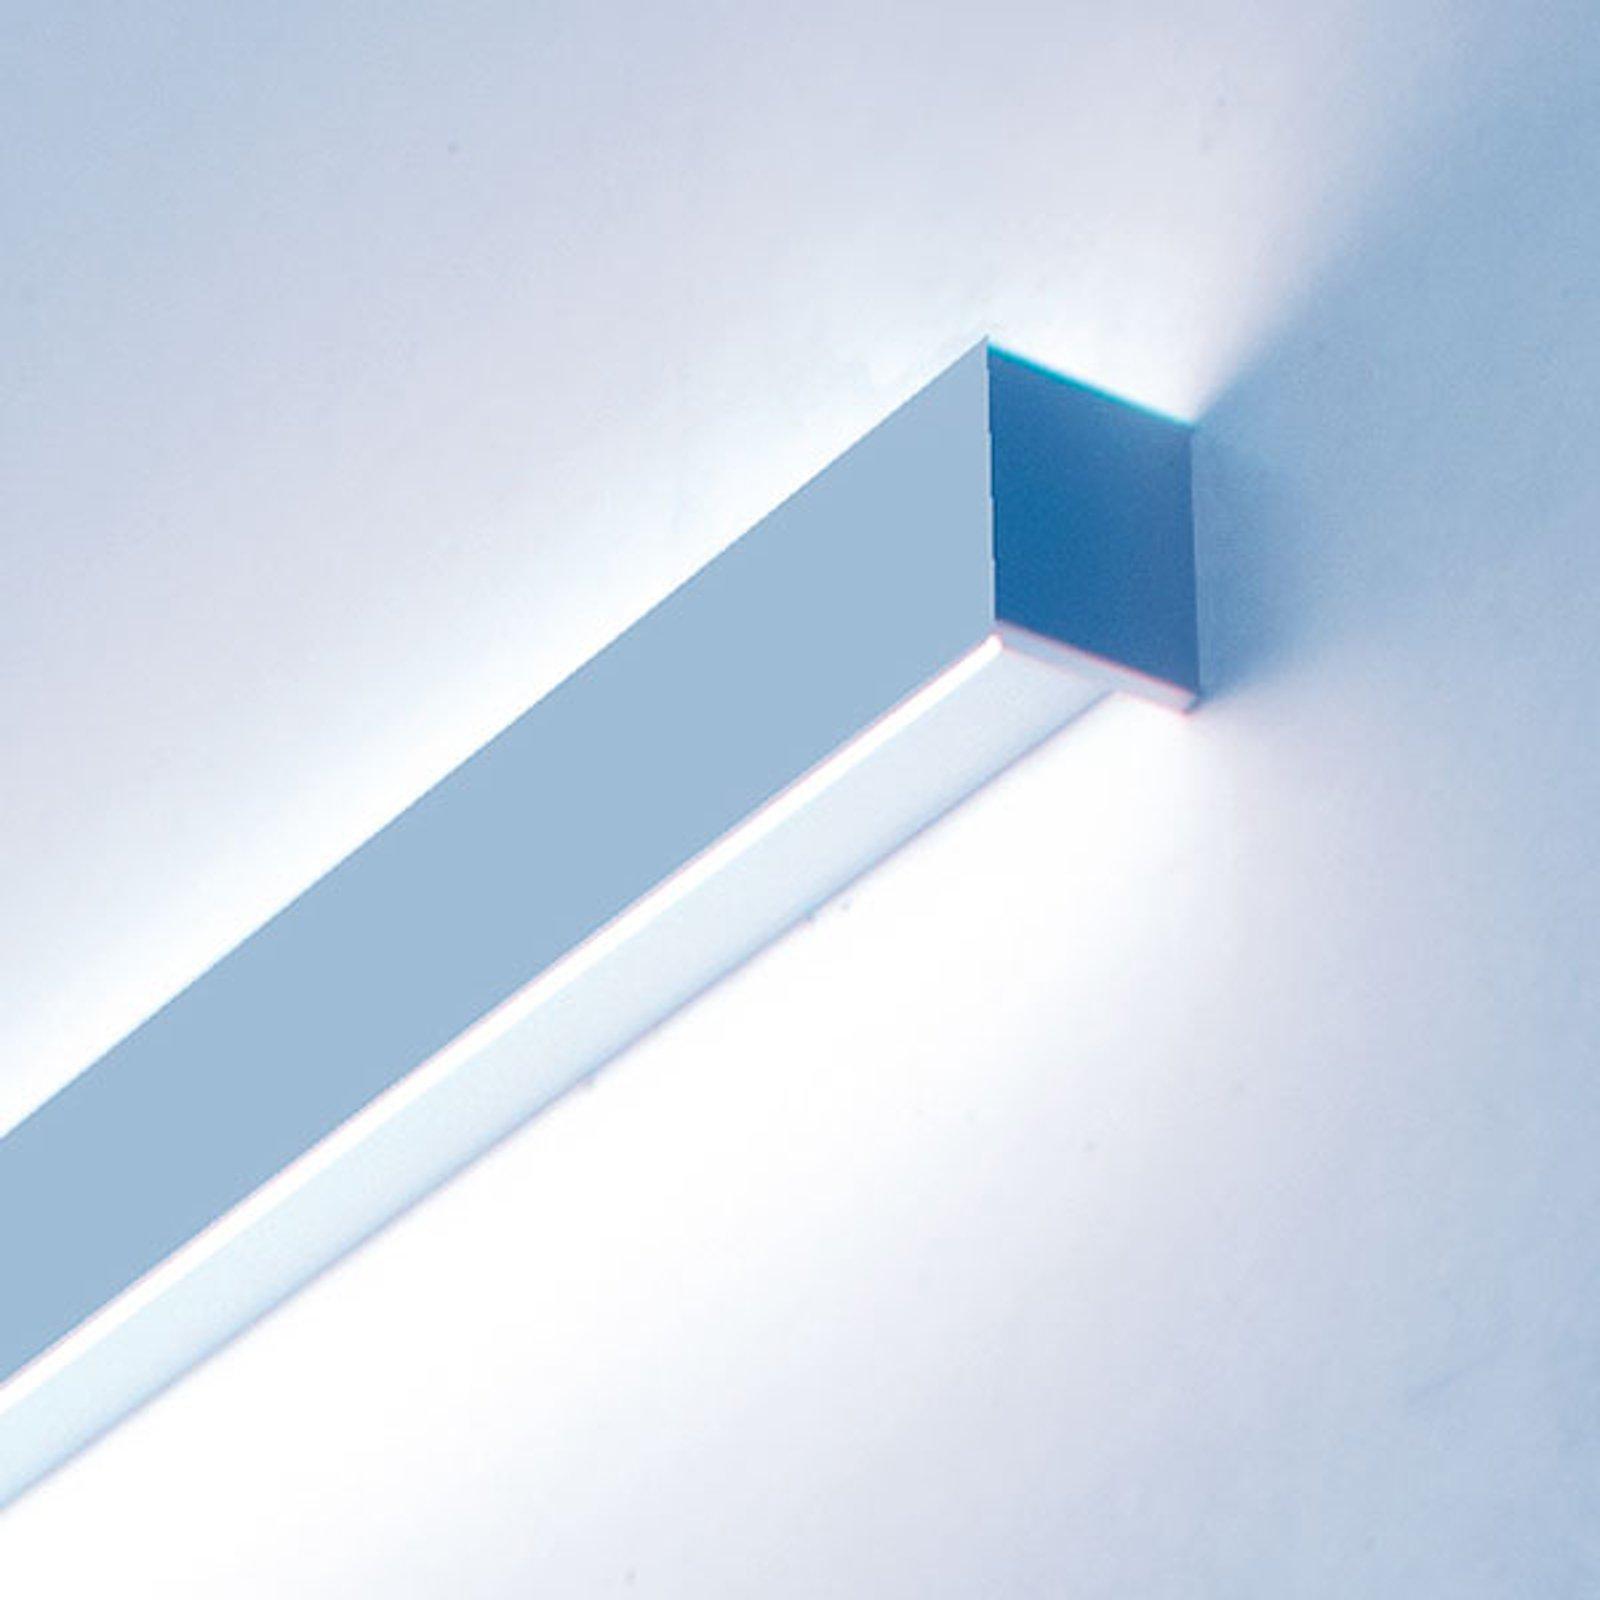 Matric W1 LED-vegglampe i 235 cm, 3 000 K